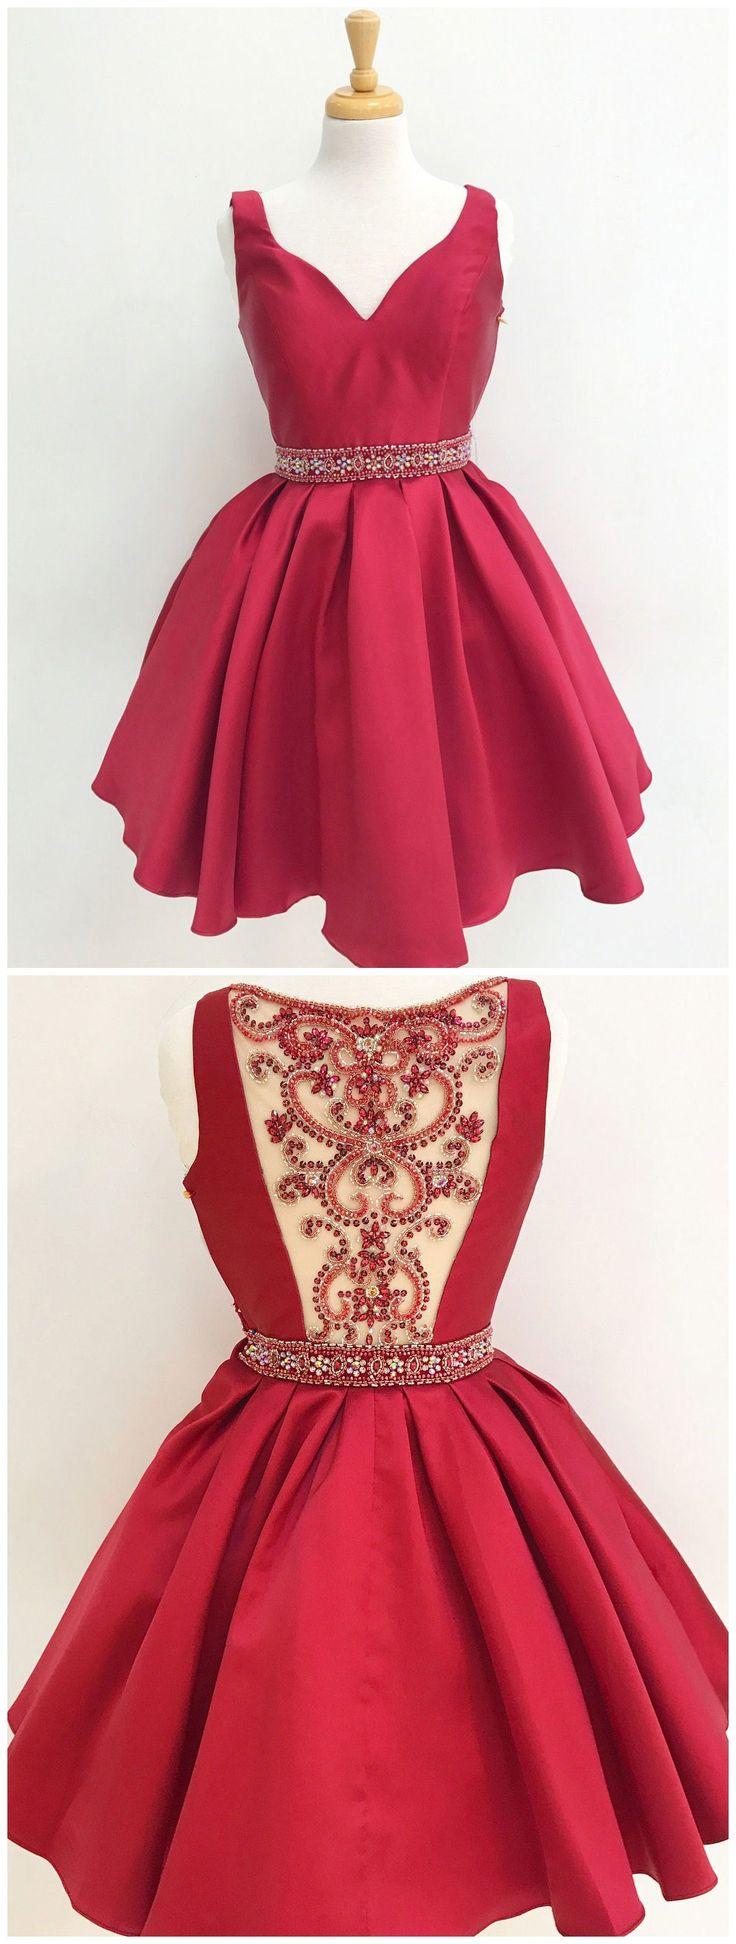 10 best Formal 2k18 images on Pinterest   Autumn dresses, Autumn ...